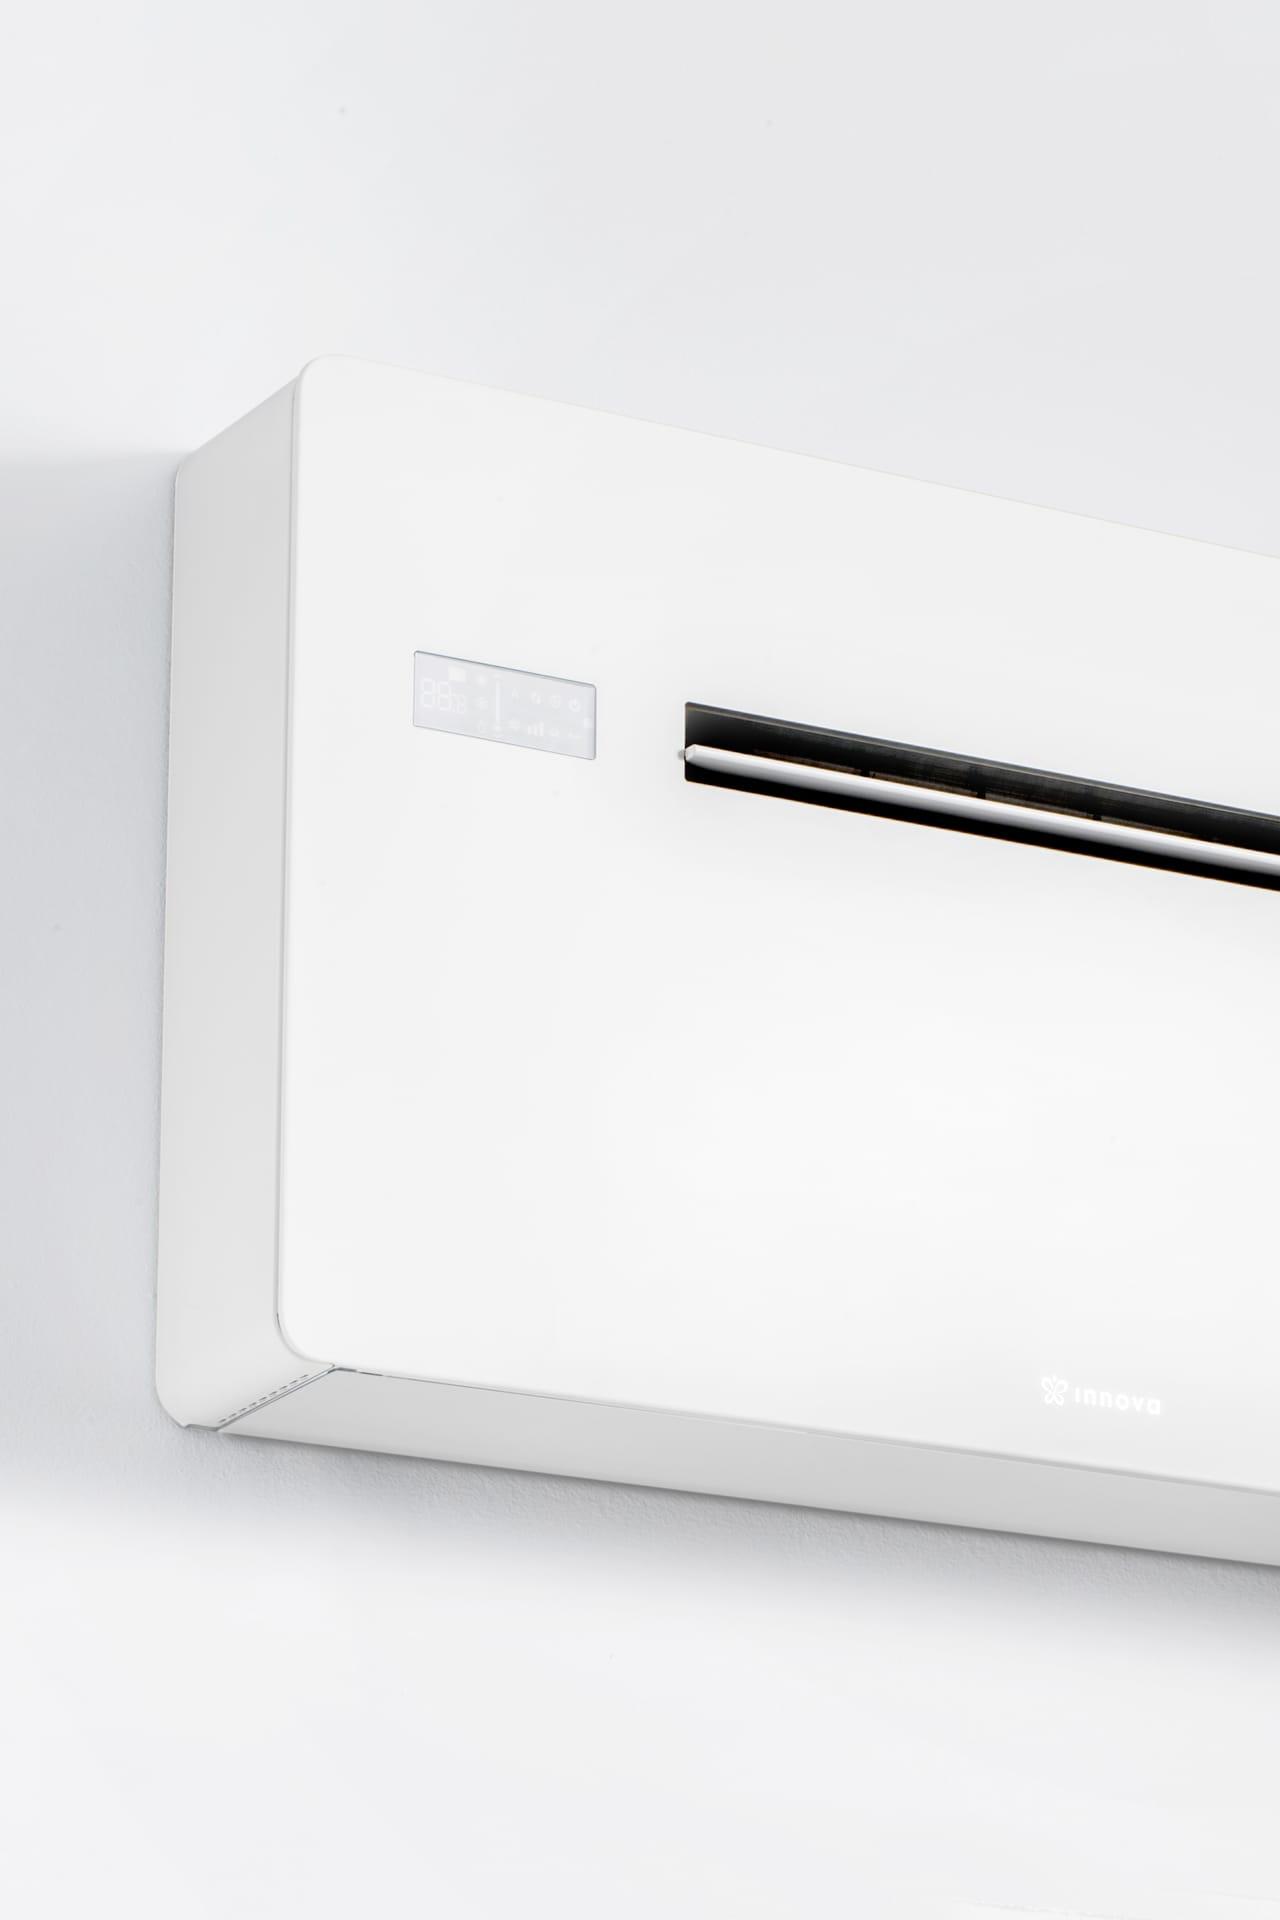 Green House Solutions zonnepanelen batterijopslag laadpalen airconditioning mac84378 aperto web